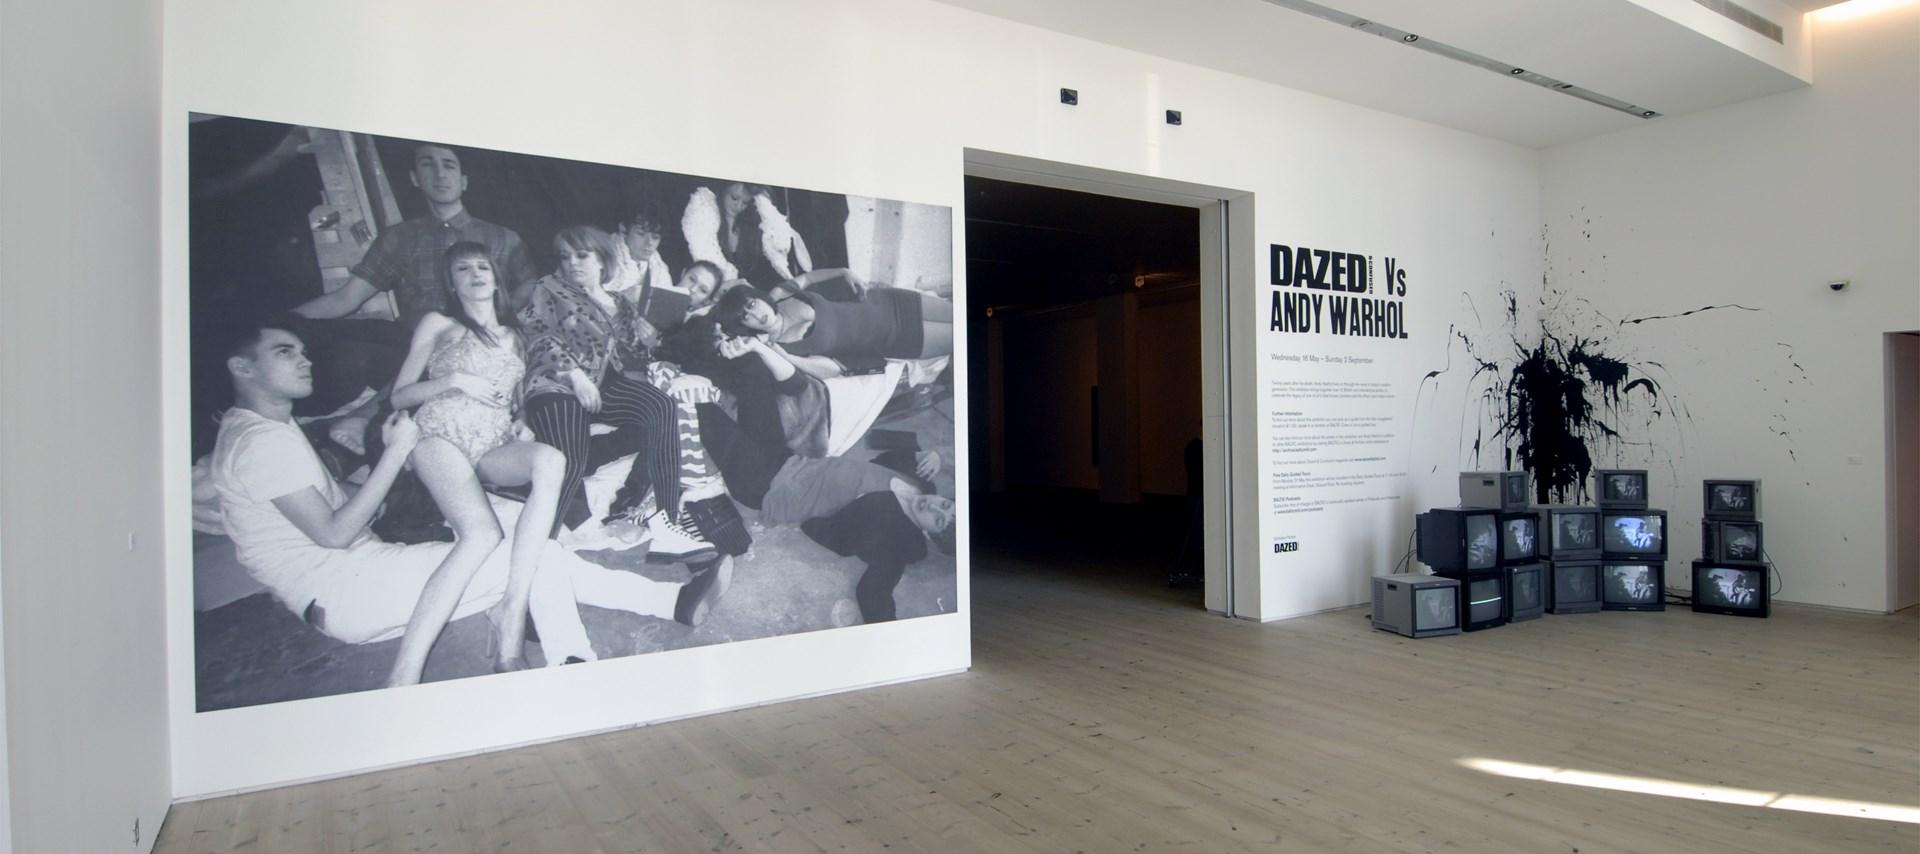 Dazed & Confused Vs Andy Warhol: Installation shot by Colin Davison